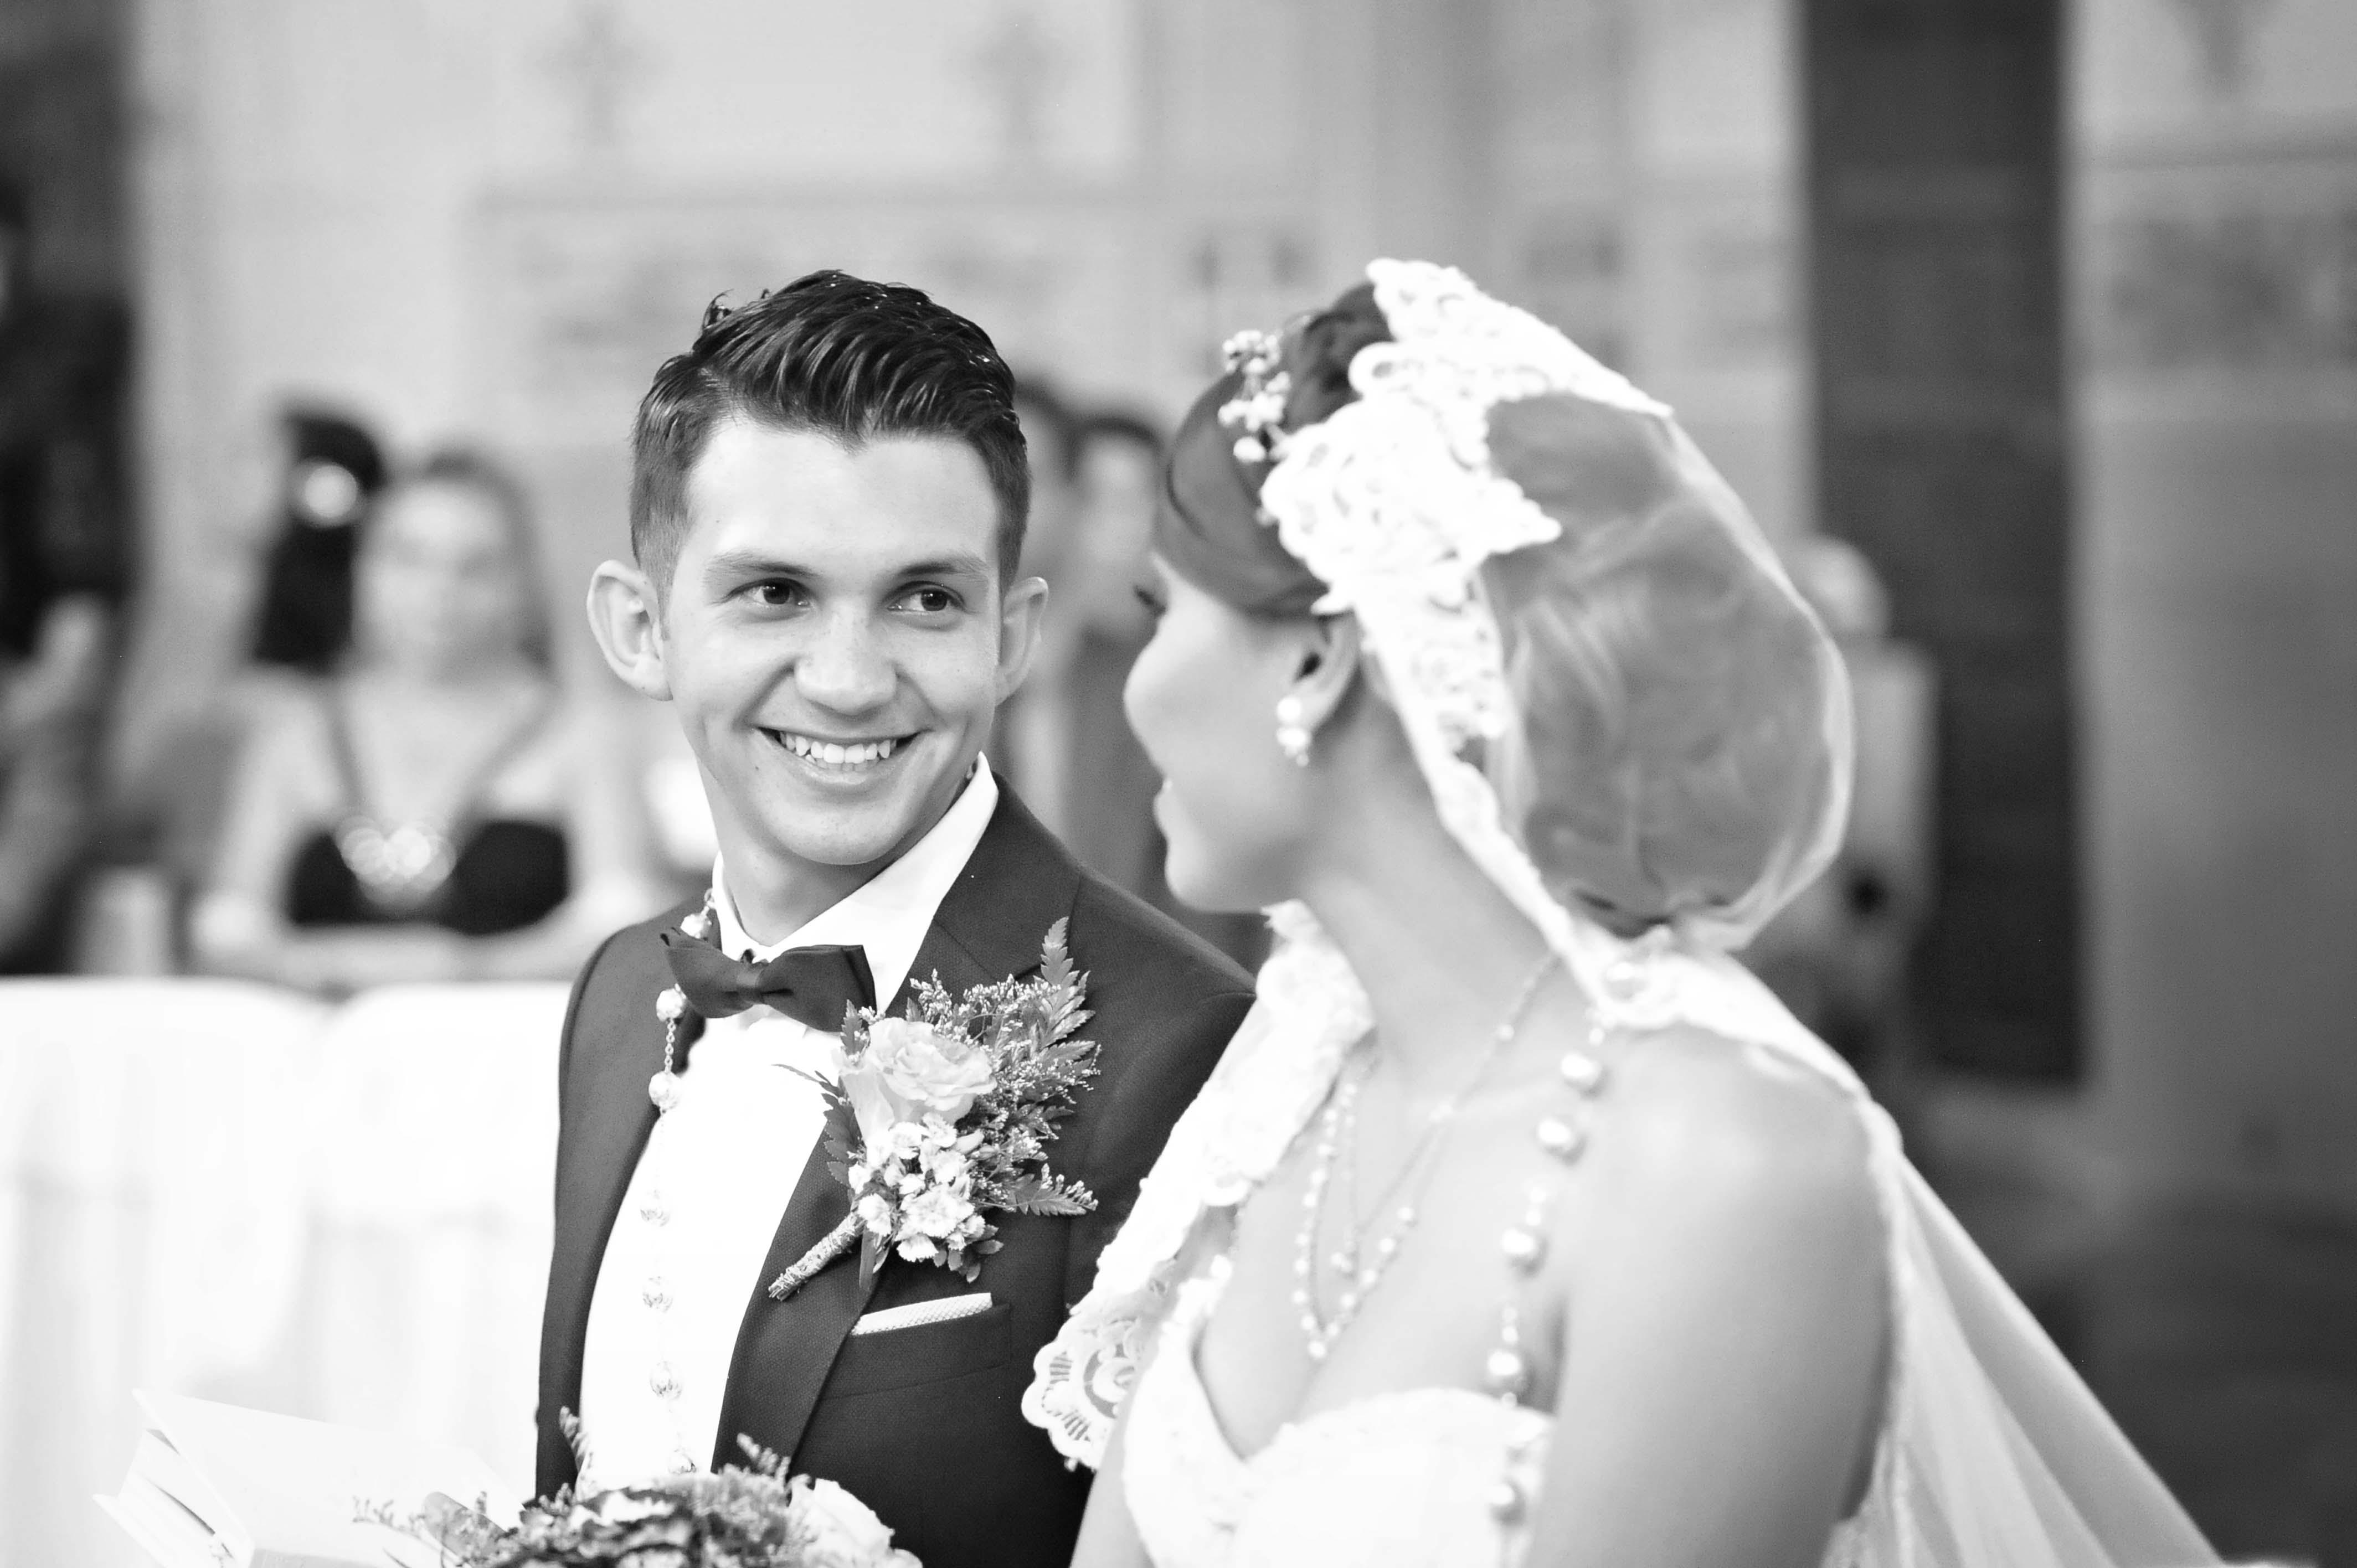 fotografo de bodas , fotografo XV años , Fotografo en Morelia